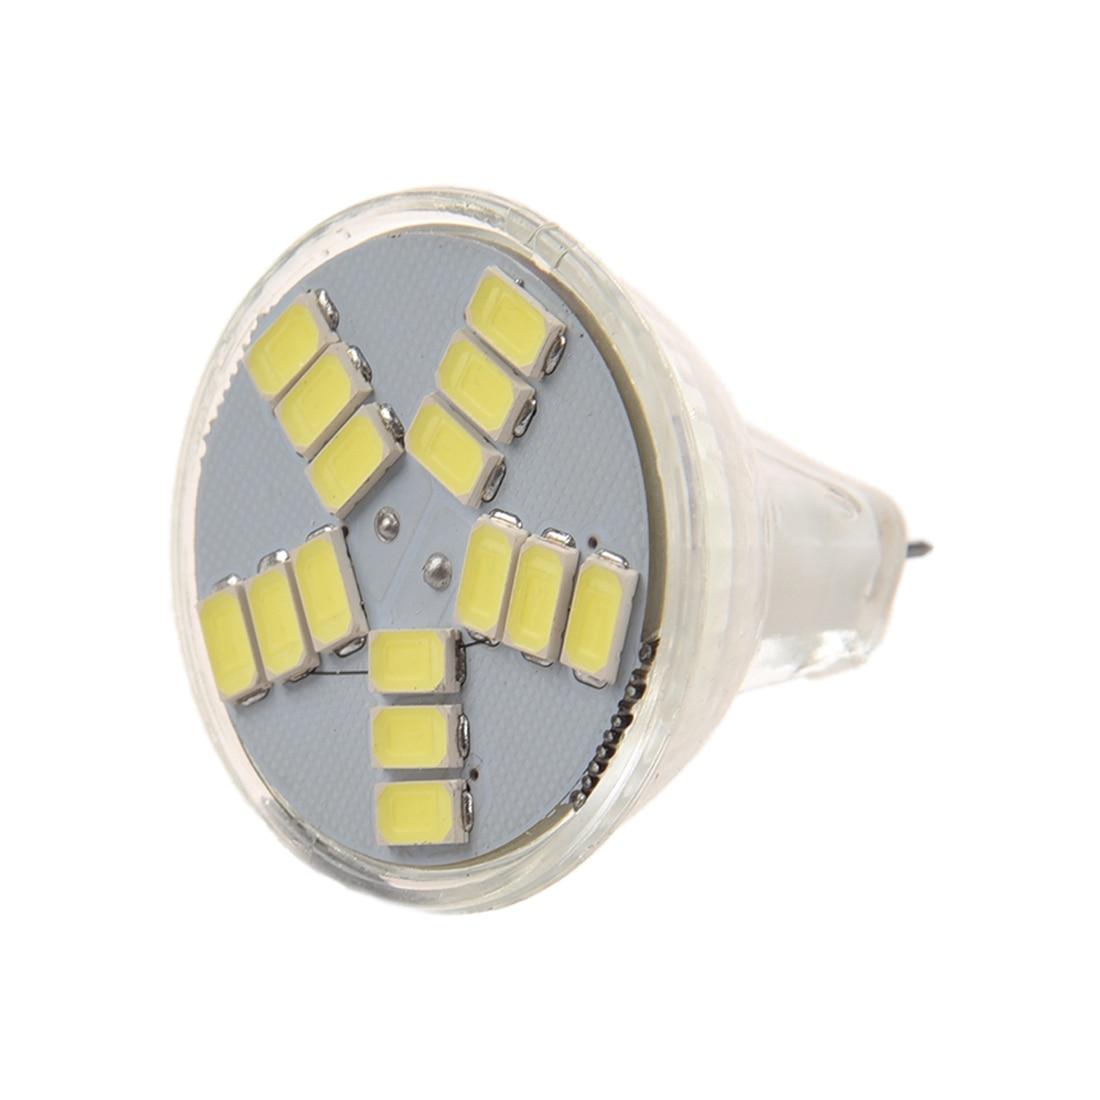 7W MR11 GU4 600LM LED Bulb Lamp 15 5630 SMD Light (White Light) luo db02 gu10 8w 600lm 3000k 16 x smd 5630 led warm white light spotlight silver 85 265v